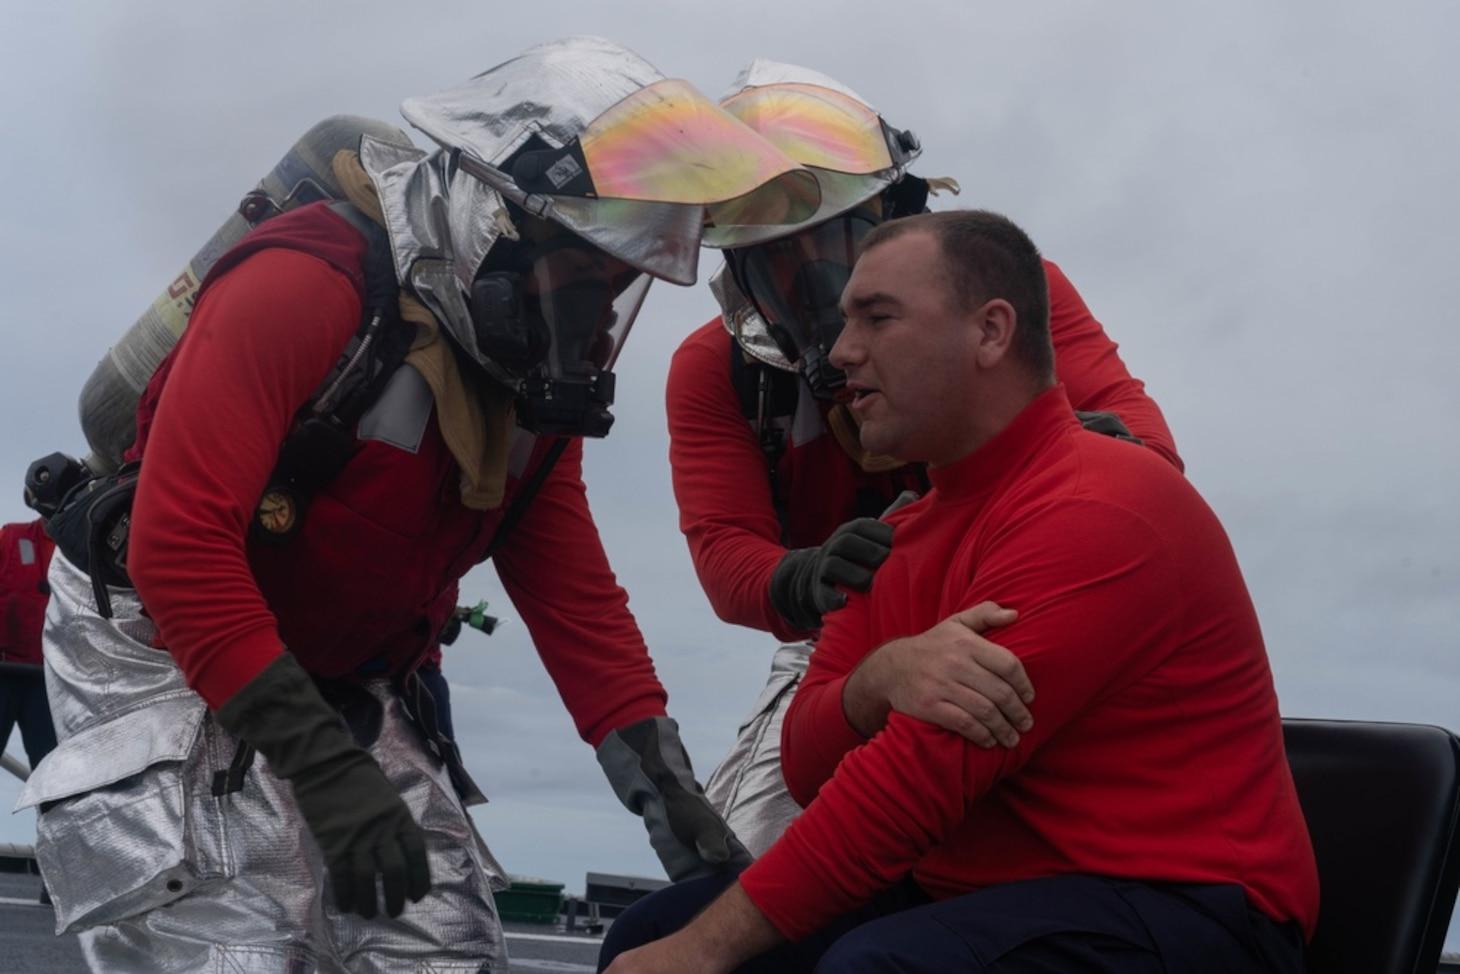 USS Jackson (LCS 6) Sailors Perform Aviation Fire Fighting Drill